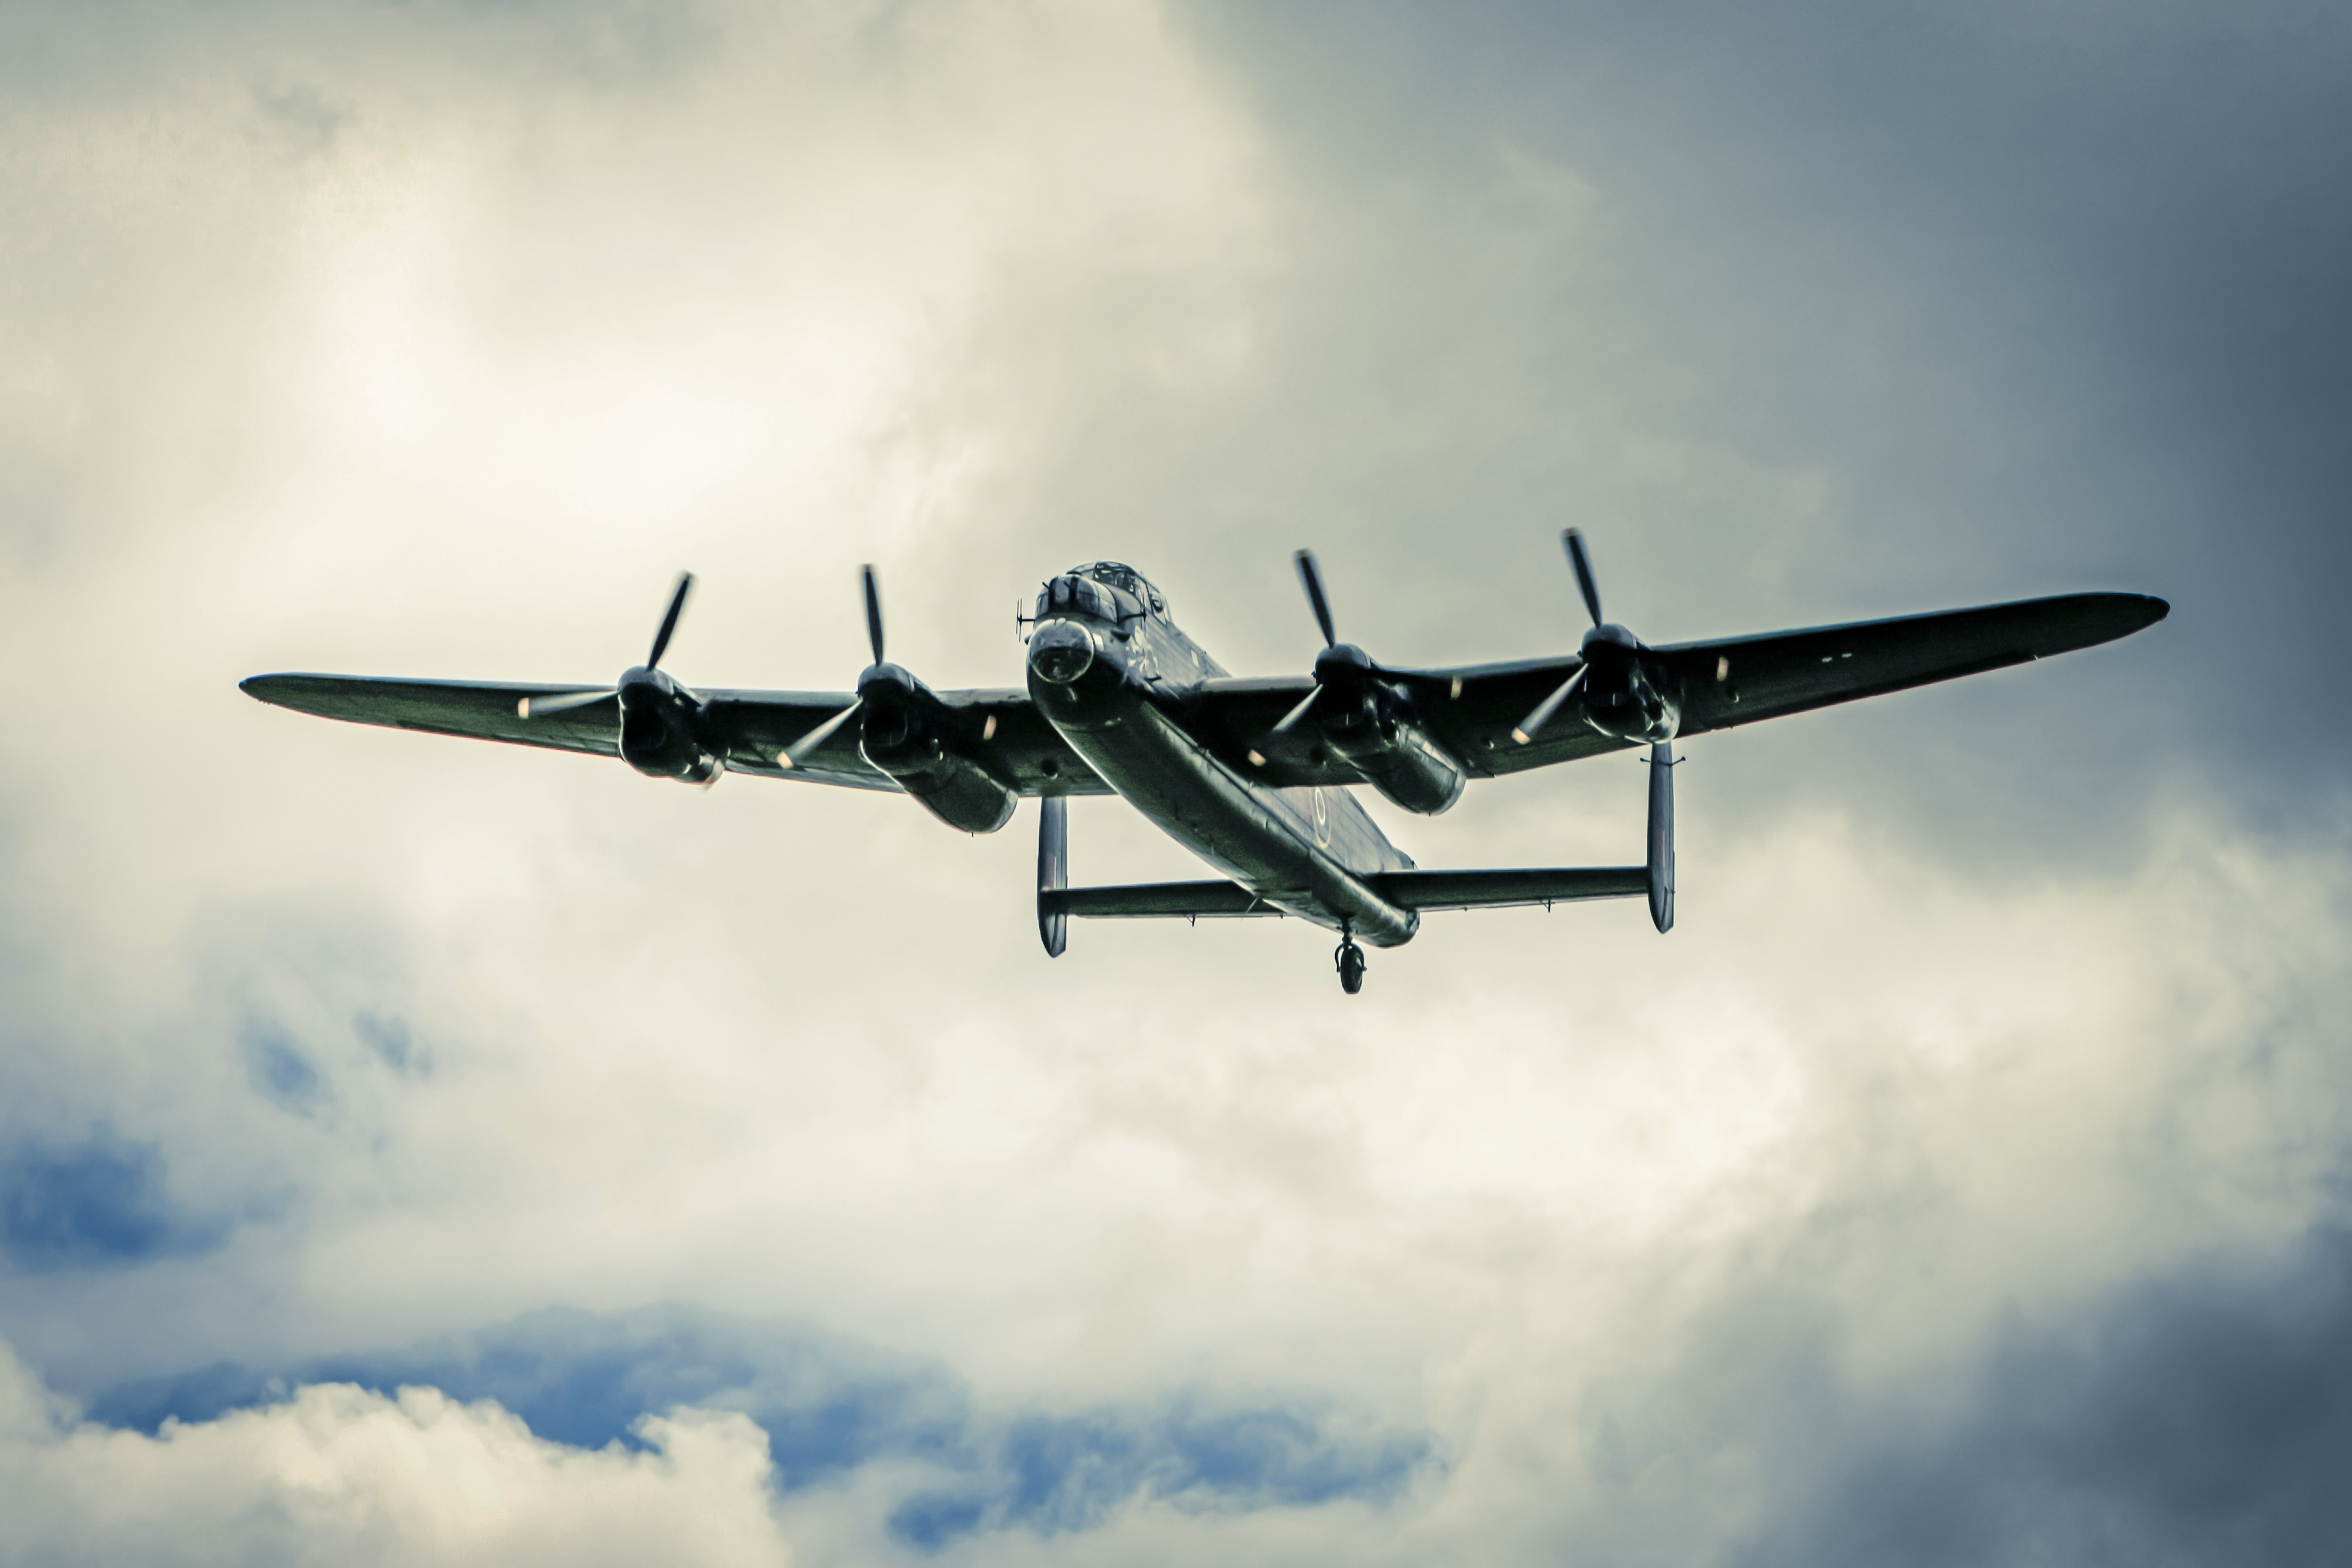 lancaster bomber vintage aviation wall decor print 12x18in satin